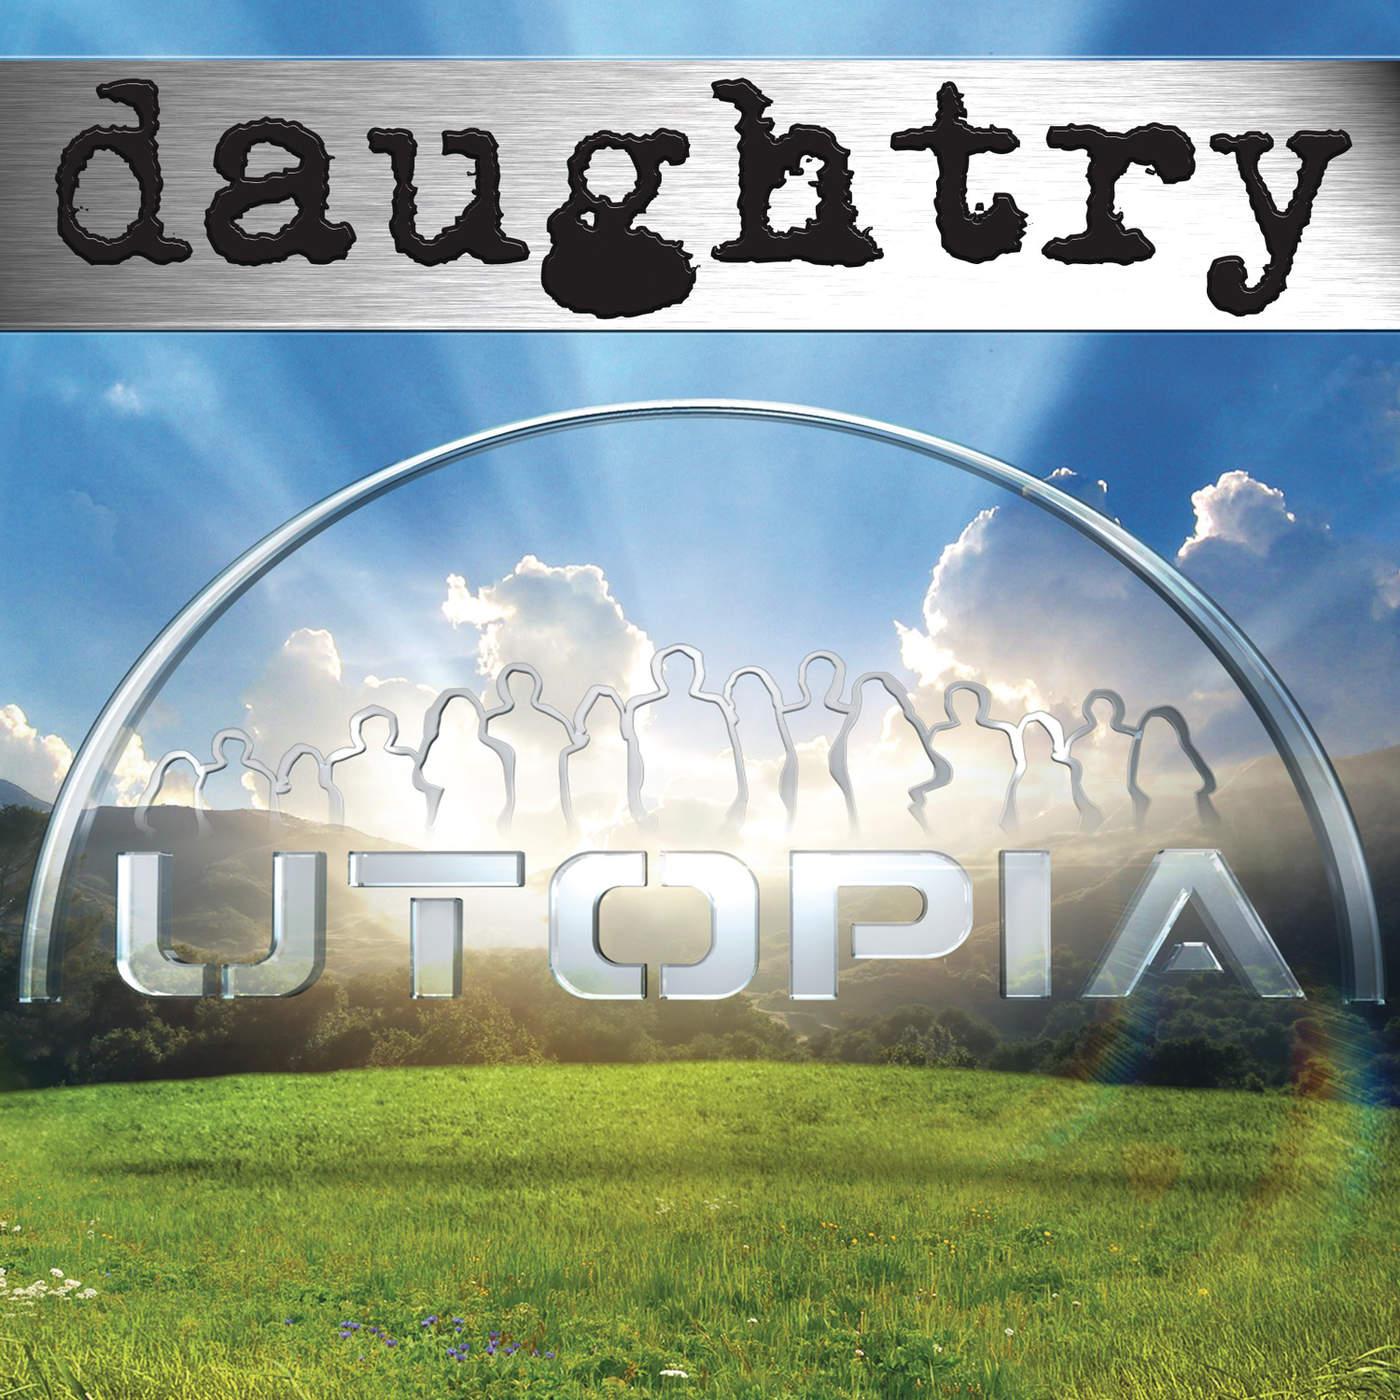 Daughtry - Utopia - Single Cover